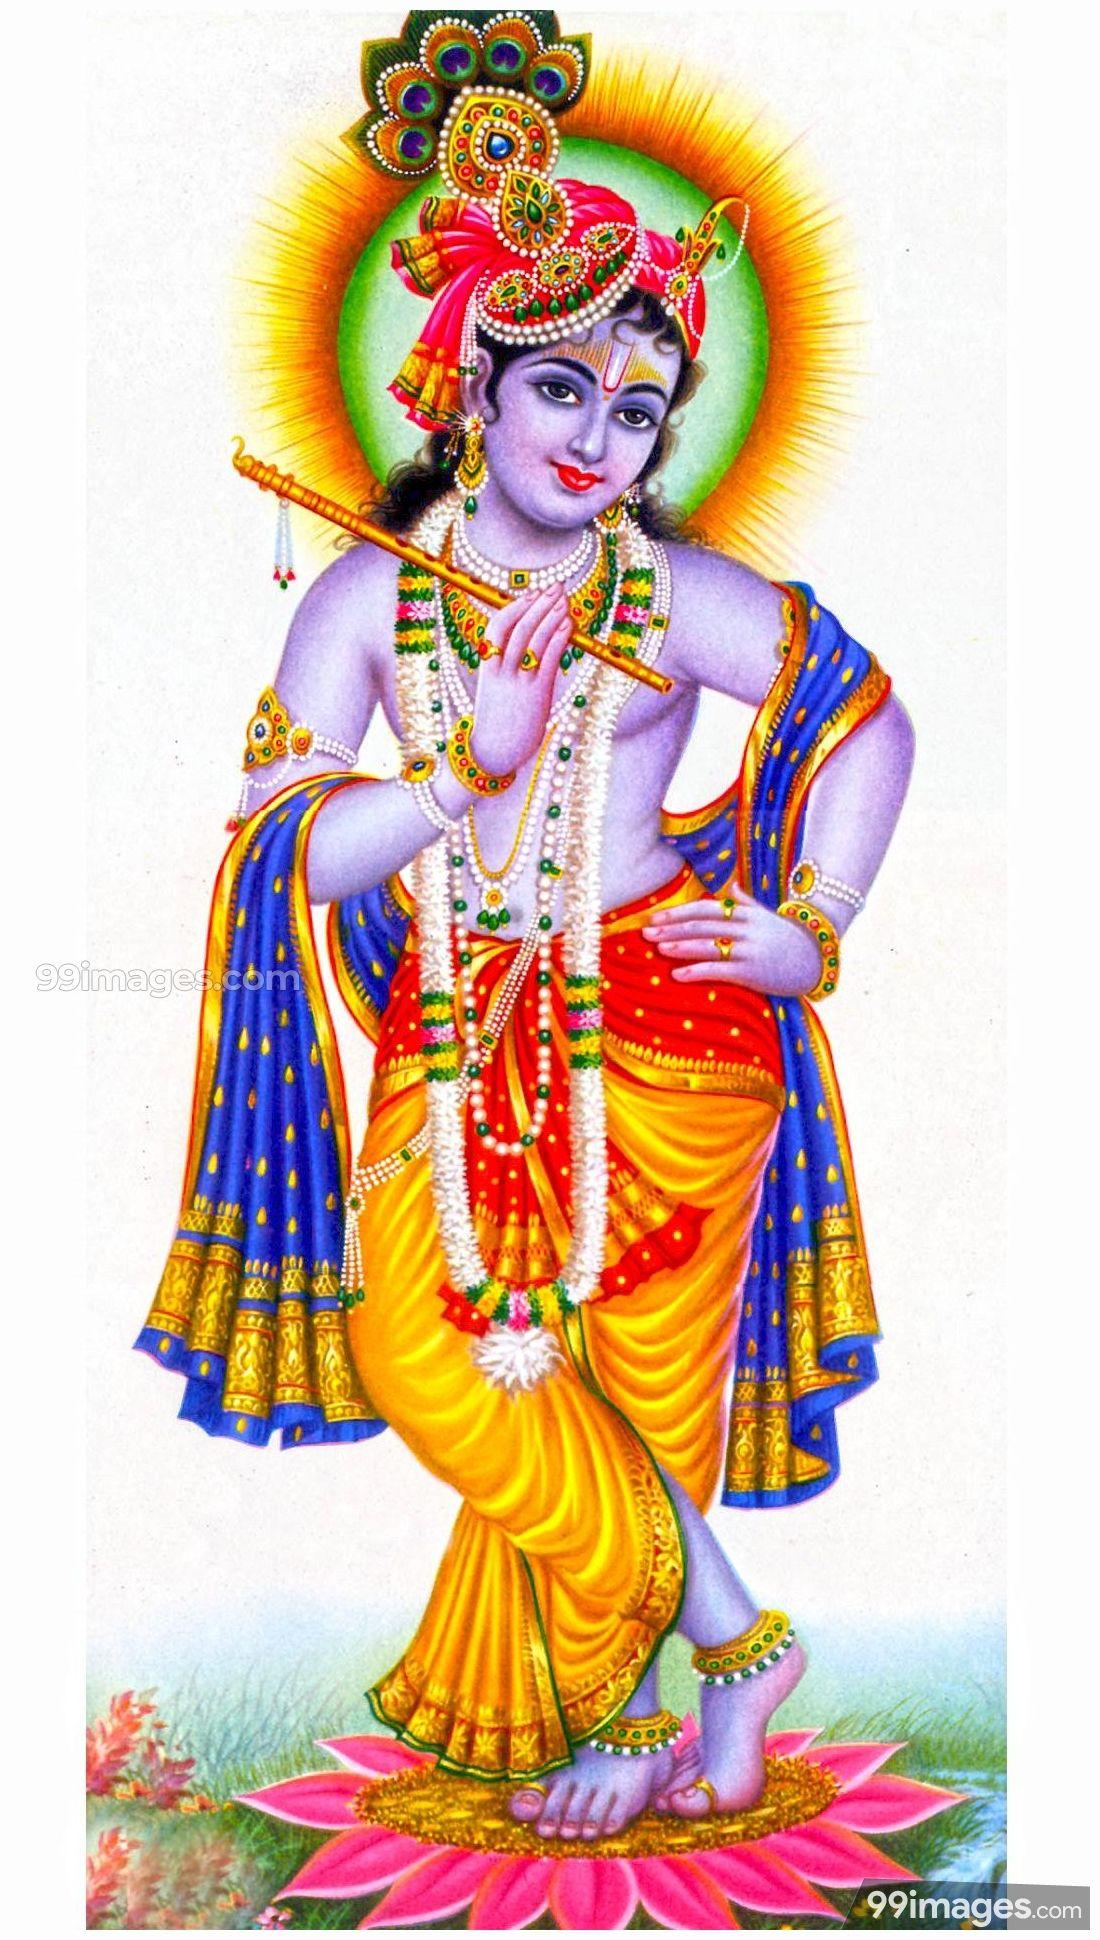 Lord Krishna Hd Wallpaper Posted By John Cunningham